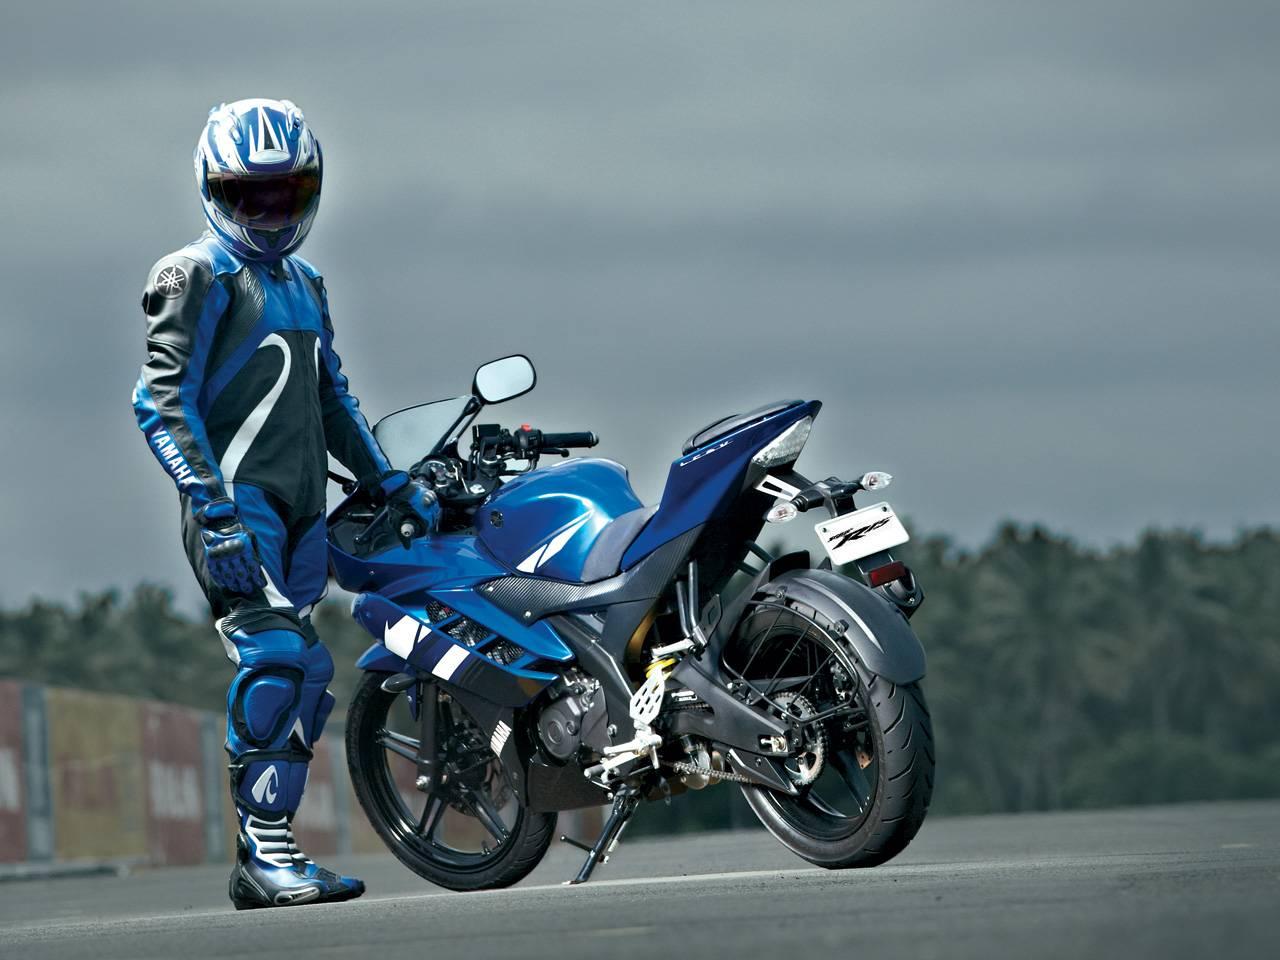 Fabricaciop: R15 Bike Stunts Wallpapers Hd